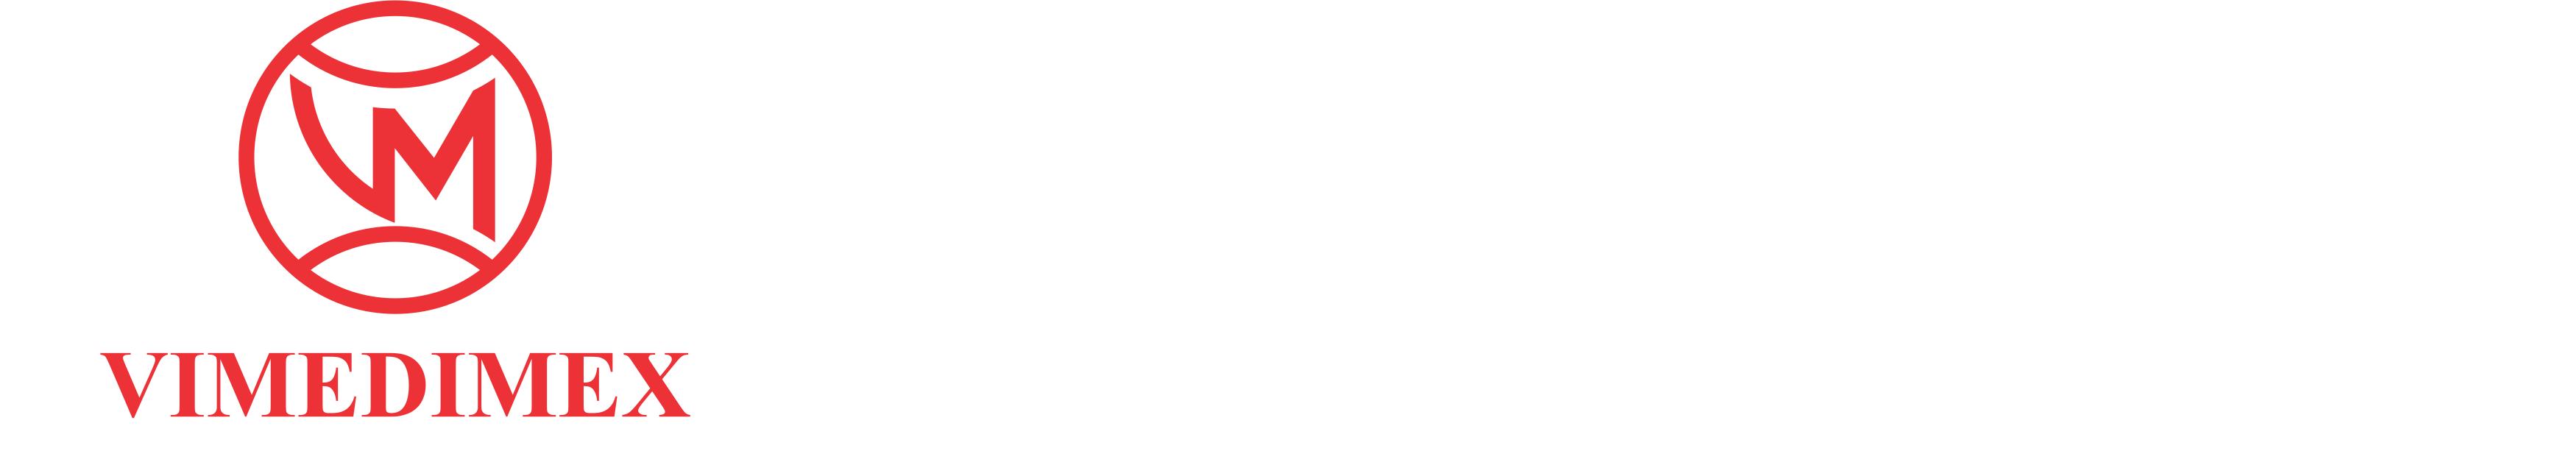 https://vietpharm.com.vn/wp-content/uploads/2021/01/Logo-Vimedimex-112-Copy.png